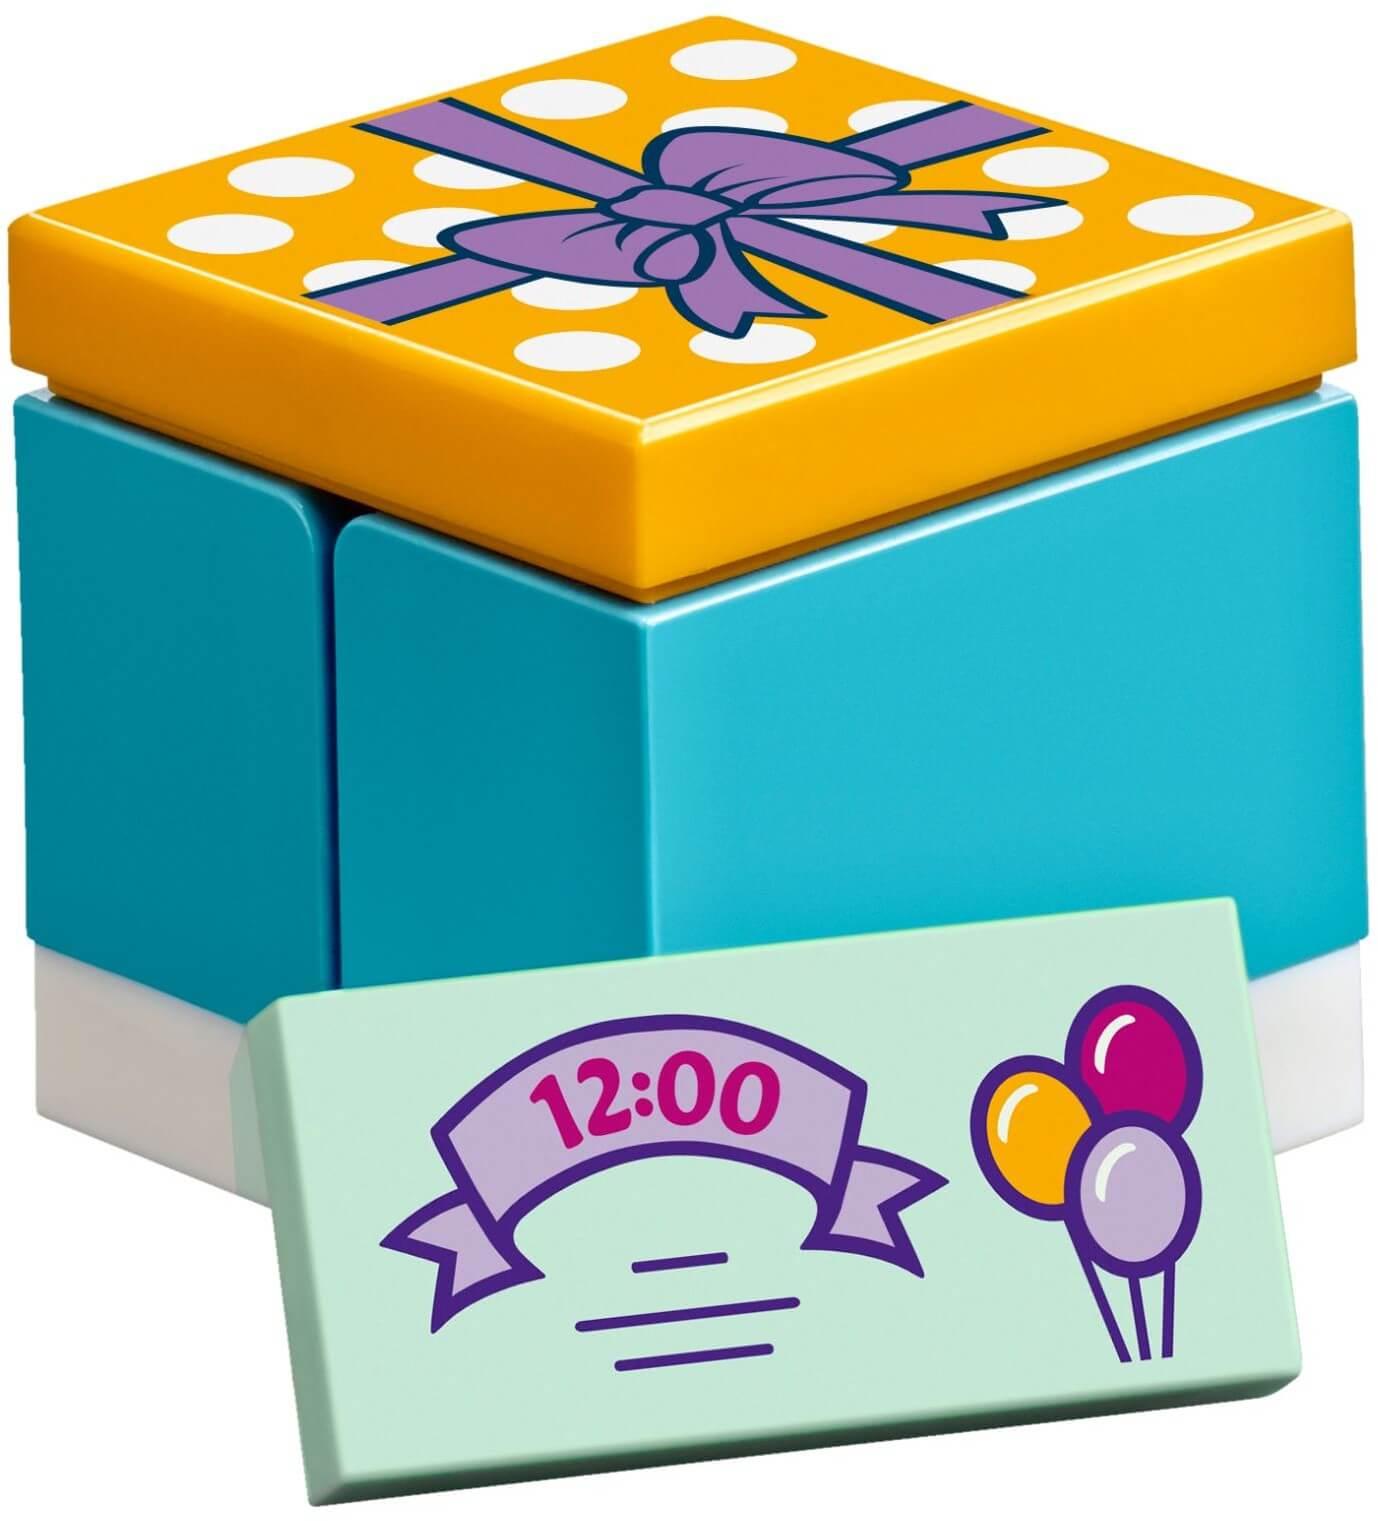 Mua đồ chơi LEGO 41113 - LEGO Friends 41113 - Bữa Tiệc Quà Tặng (LEGO Friends Party Gift Shop 41113)